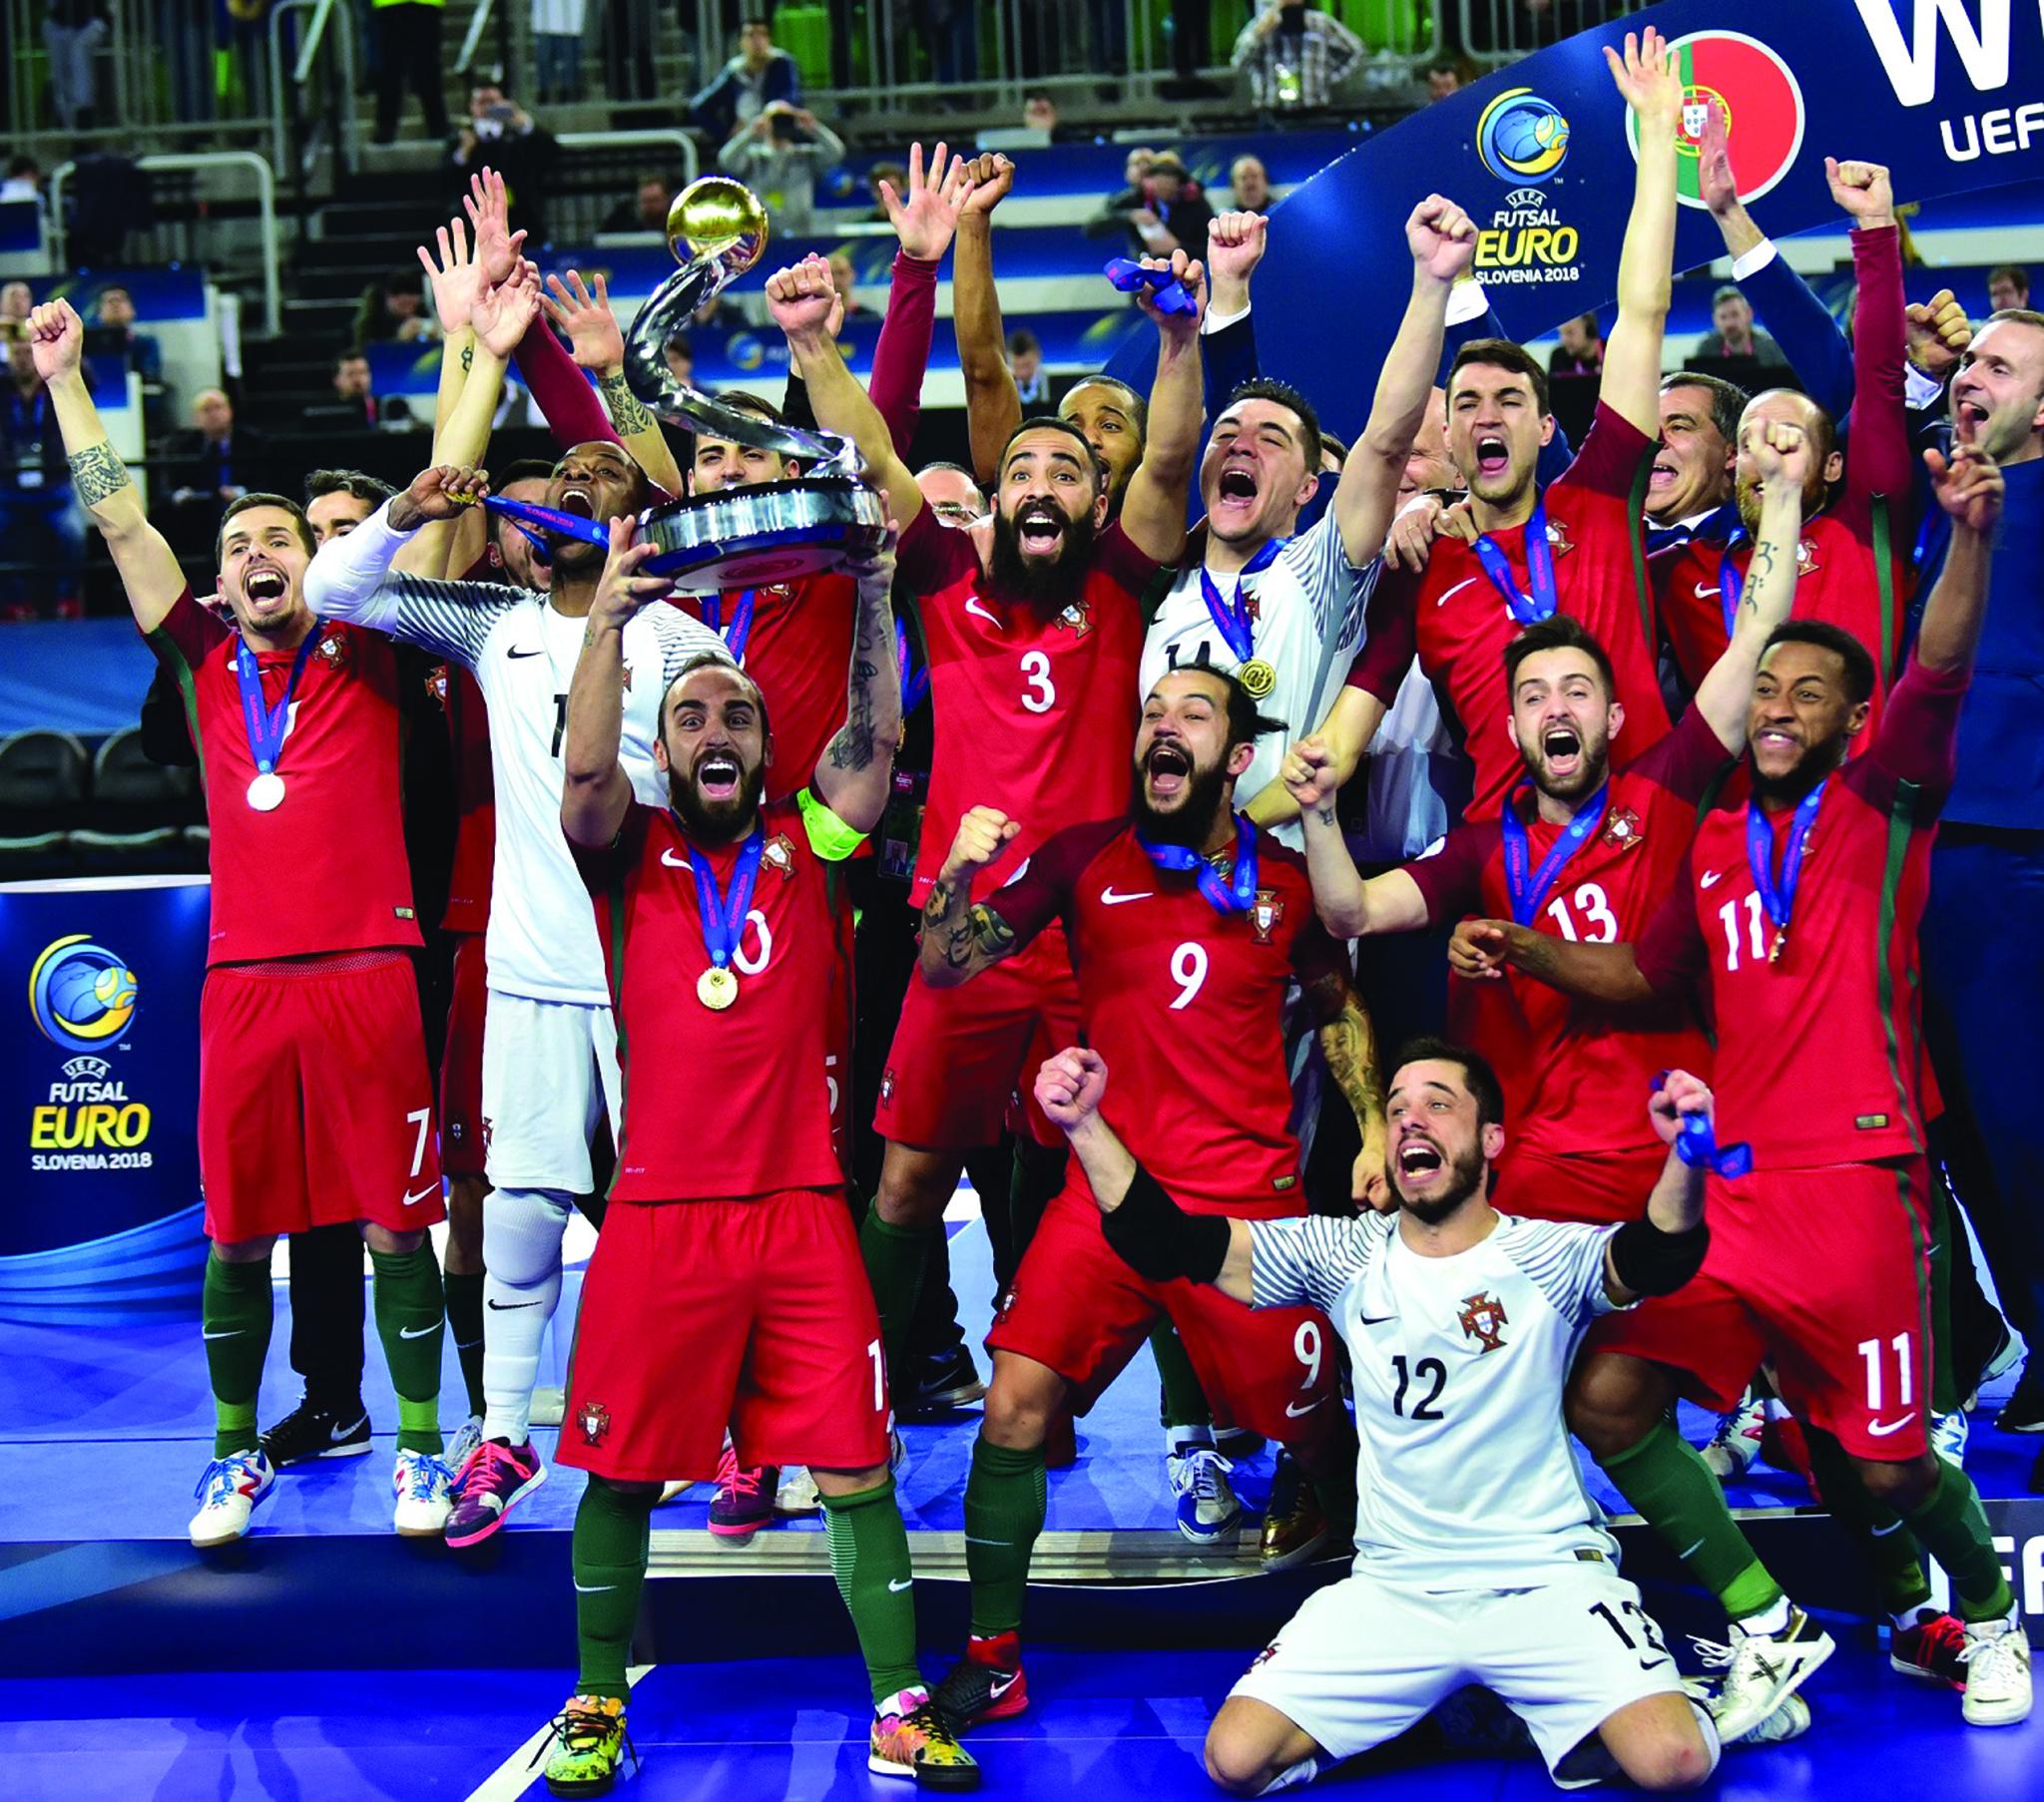 ... sagra-se campeão europeu. epa06512933 Team Portugal Winner on the  Tournament at the UEFA FUTSAL EURO 2018 final game at the Arena Stozice 3cddebdb0a247